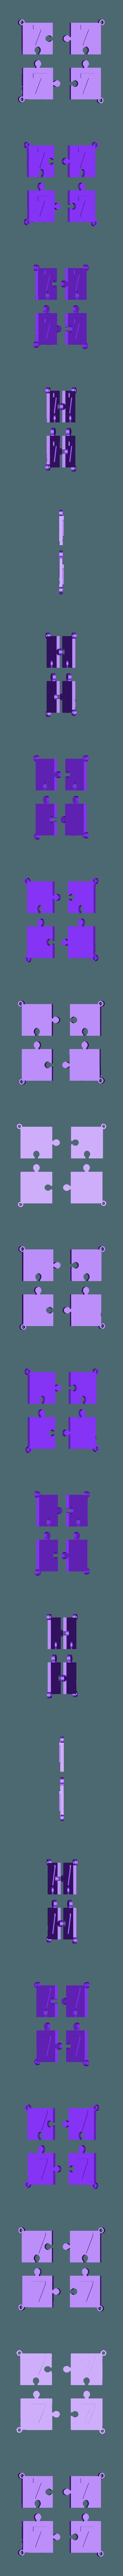 puzzle 7.stl Download STL file puzzle key ring • 3D printing design, catf3d